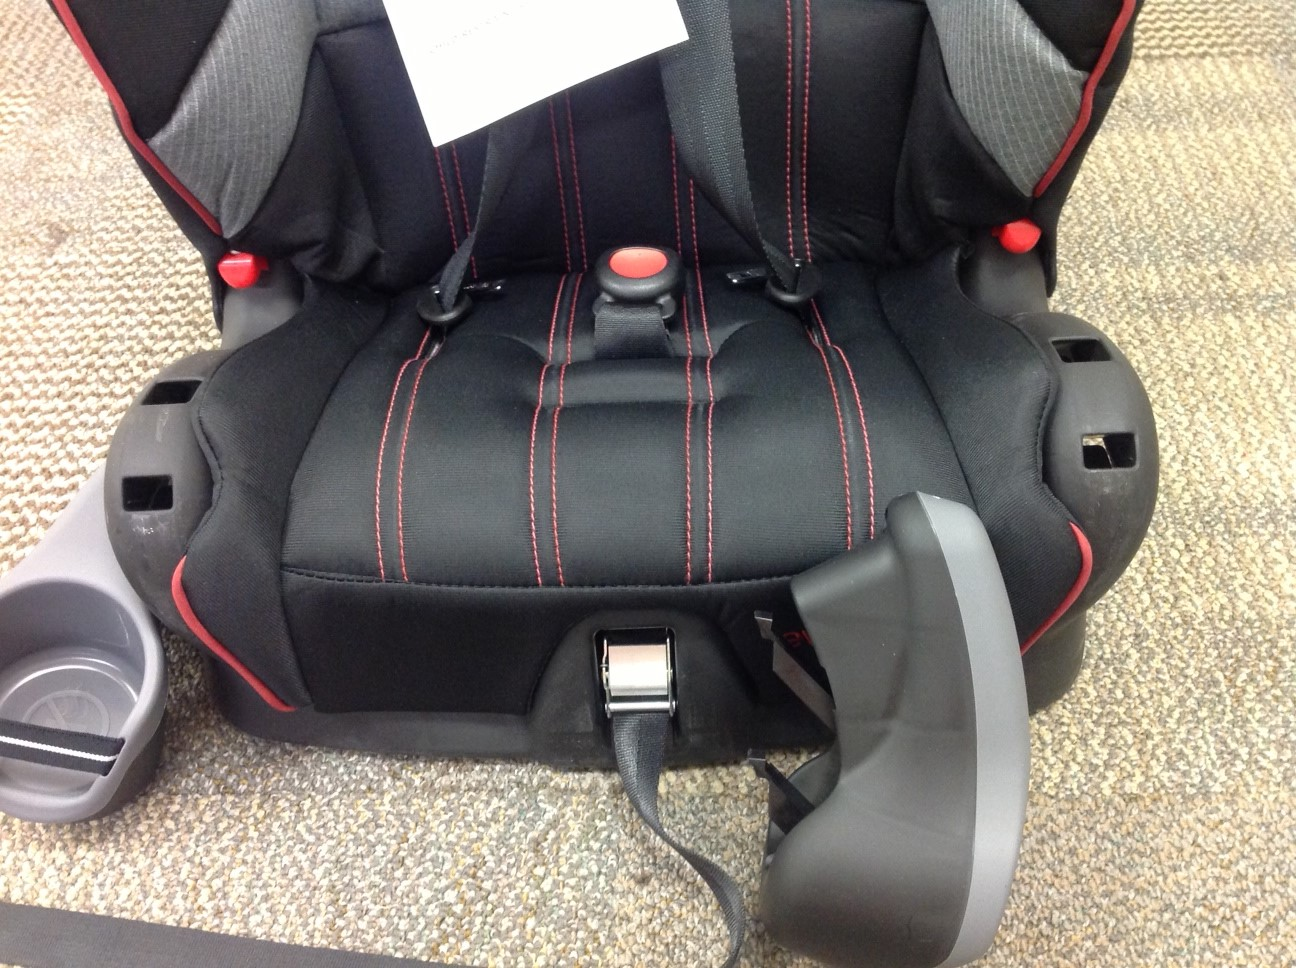 Evenflo Maestro Booster Seat Manual